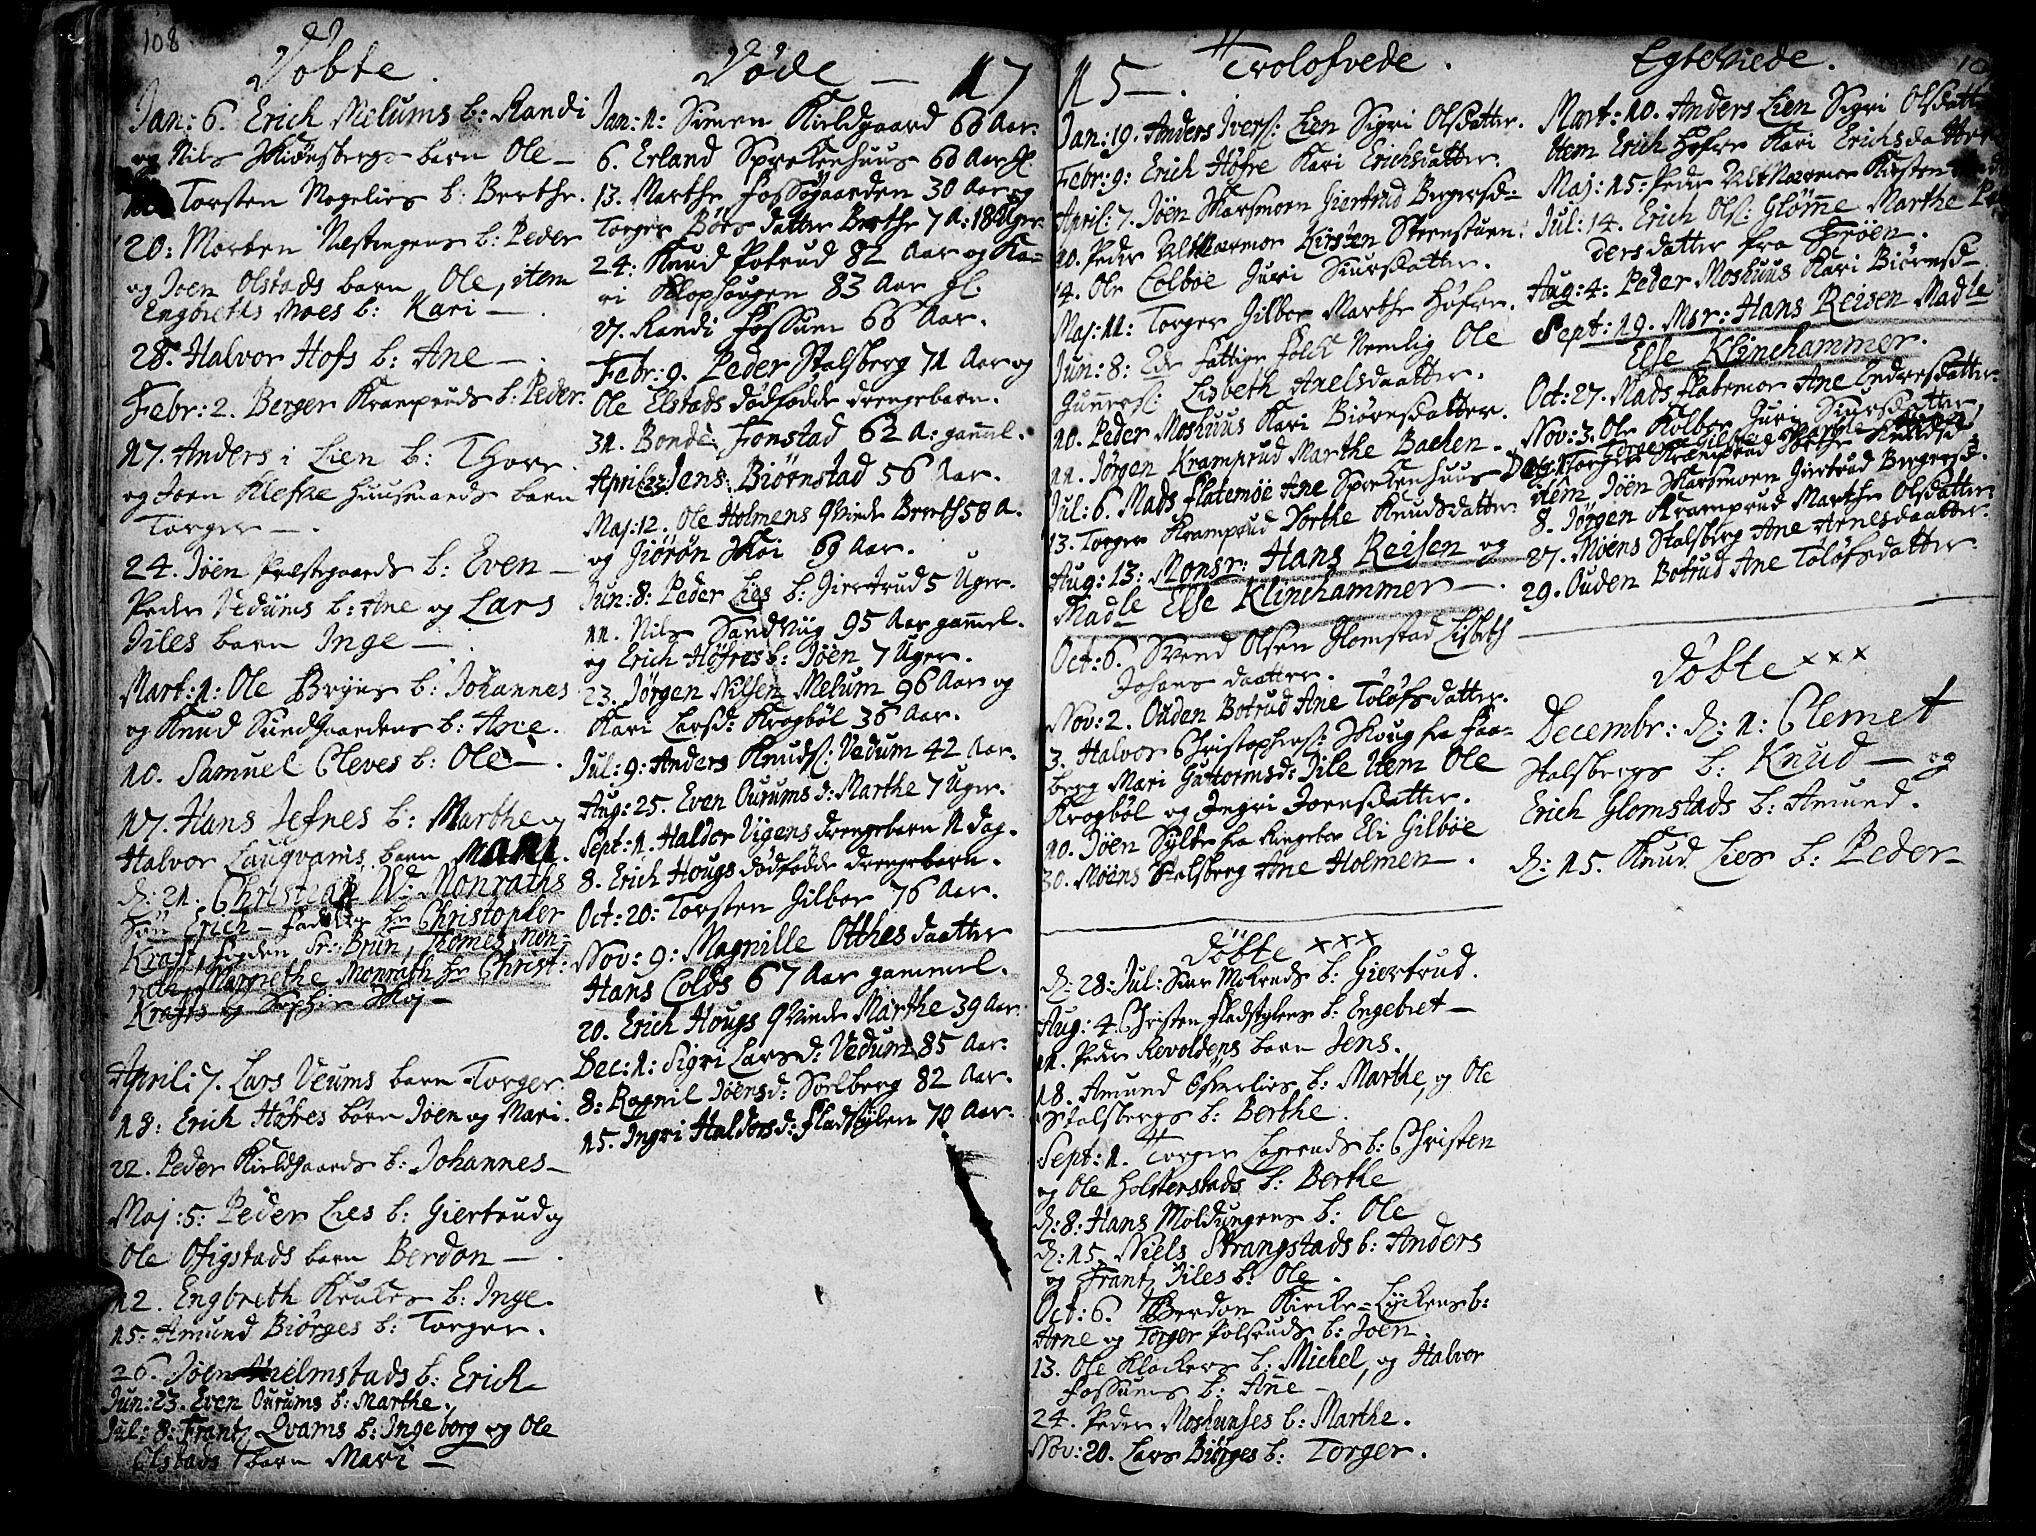 SAH, Øyer prestekontor, Ministerialbok nr. 1, 1671-1727, s. 108-109